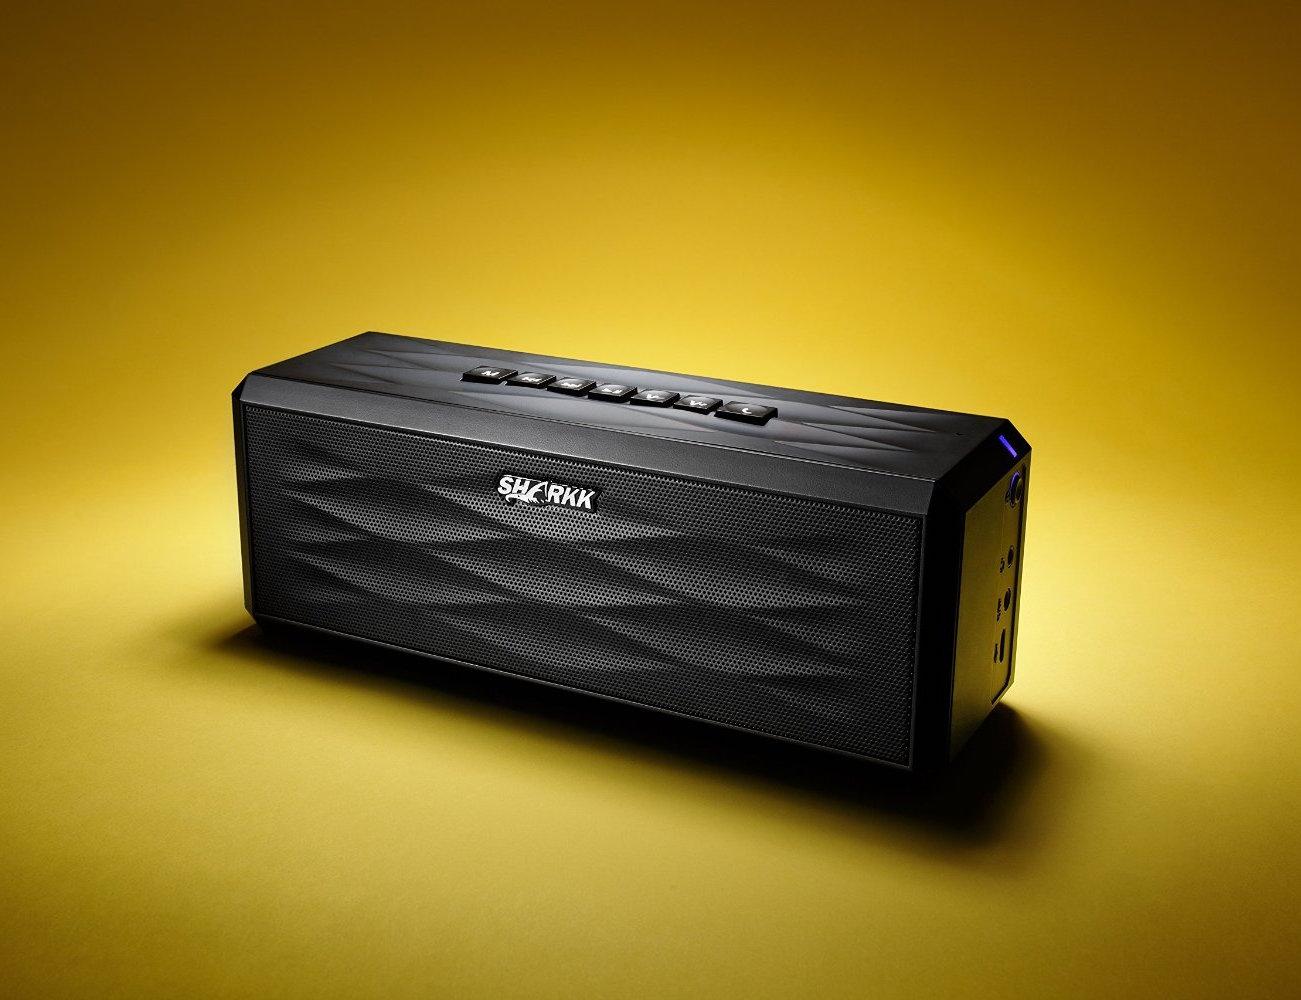 sharkk-boombox-portable-bluetooth-speaker-03